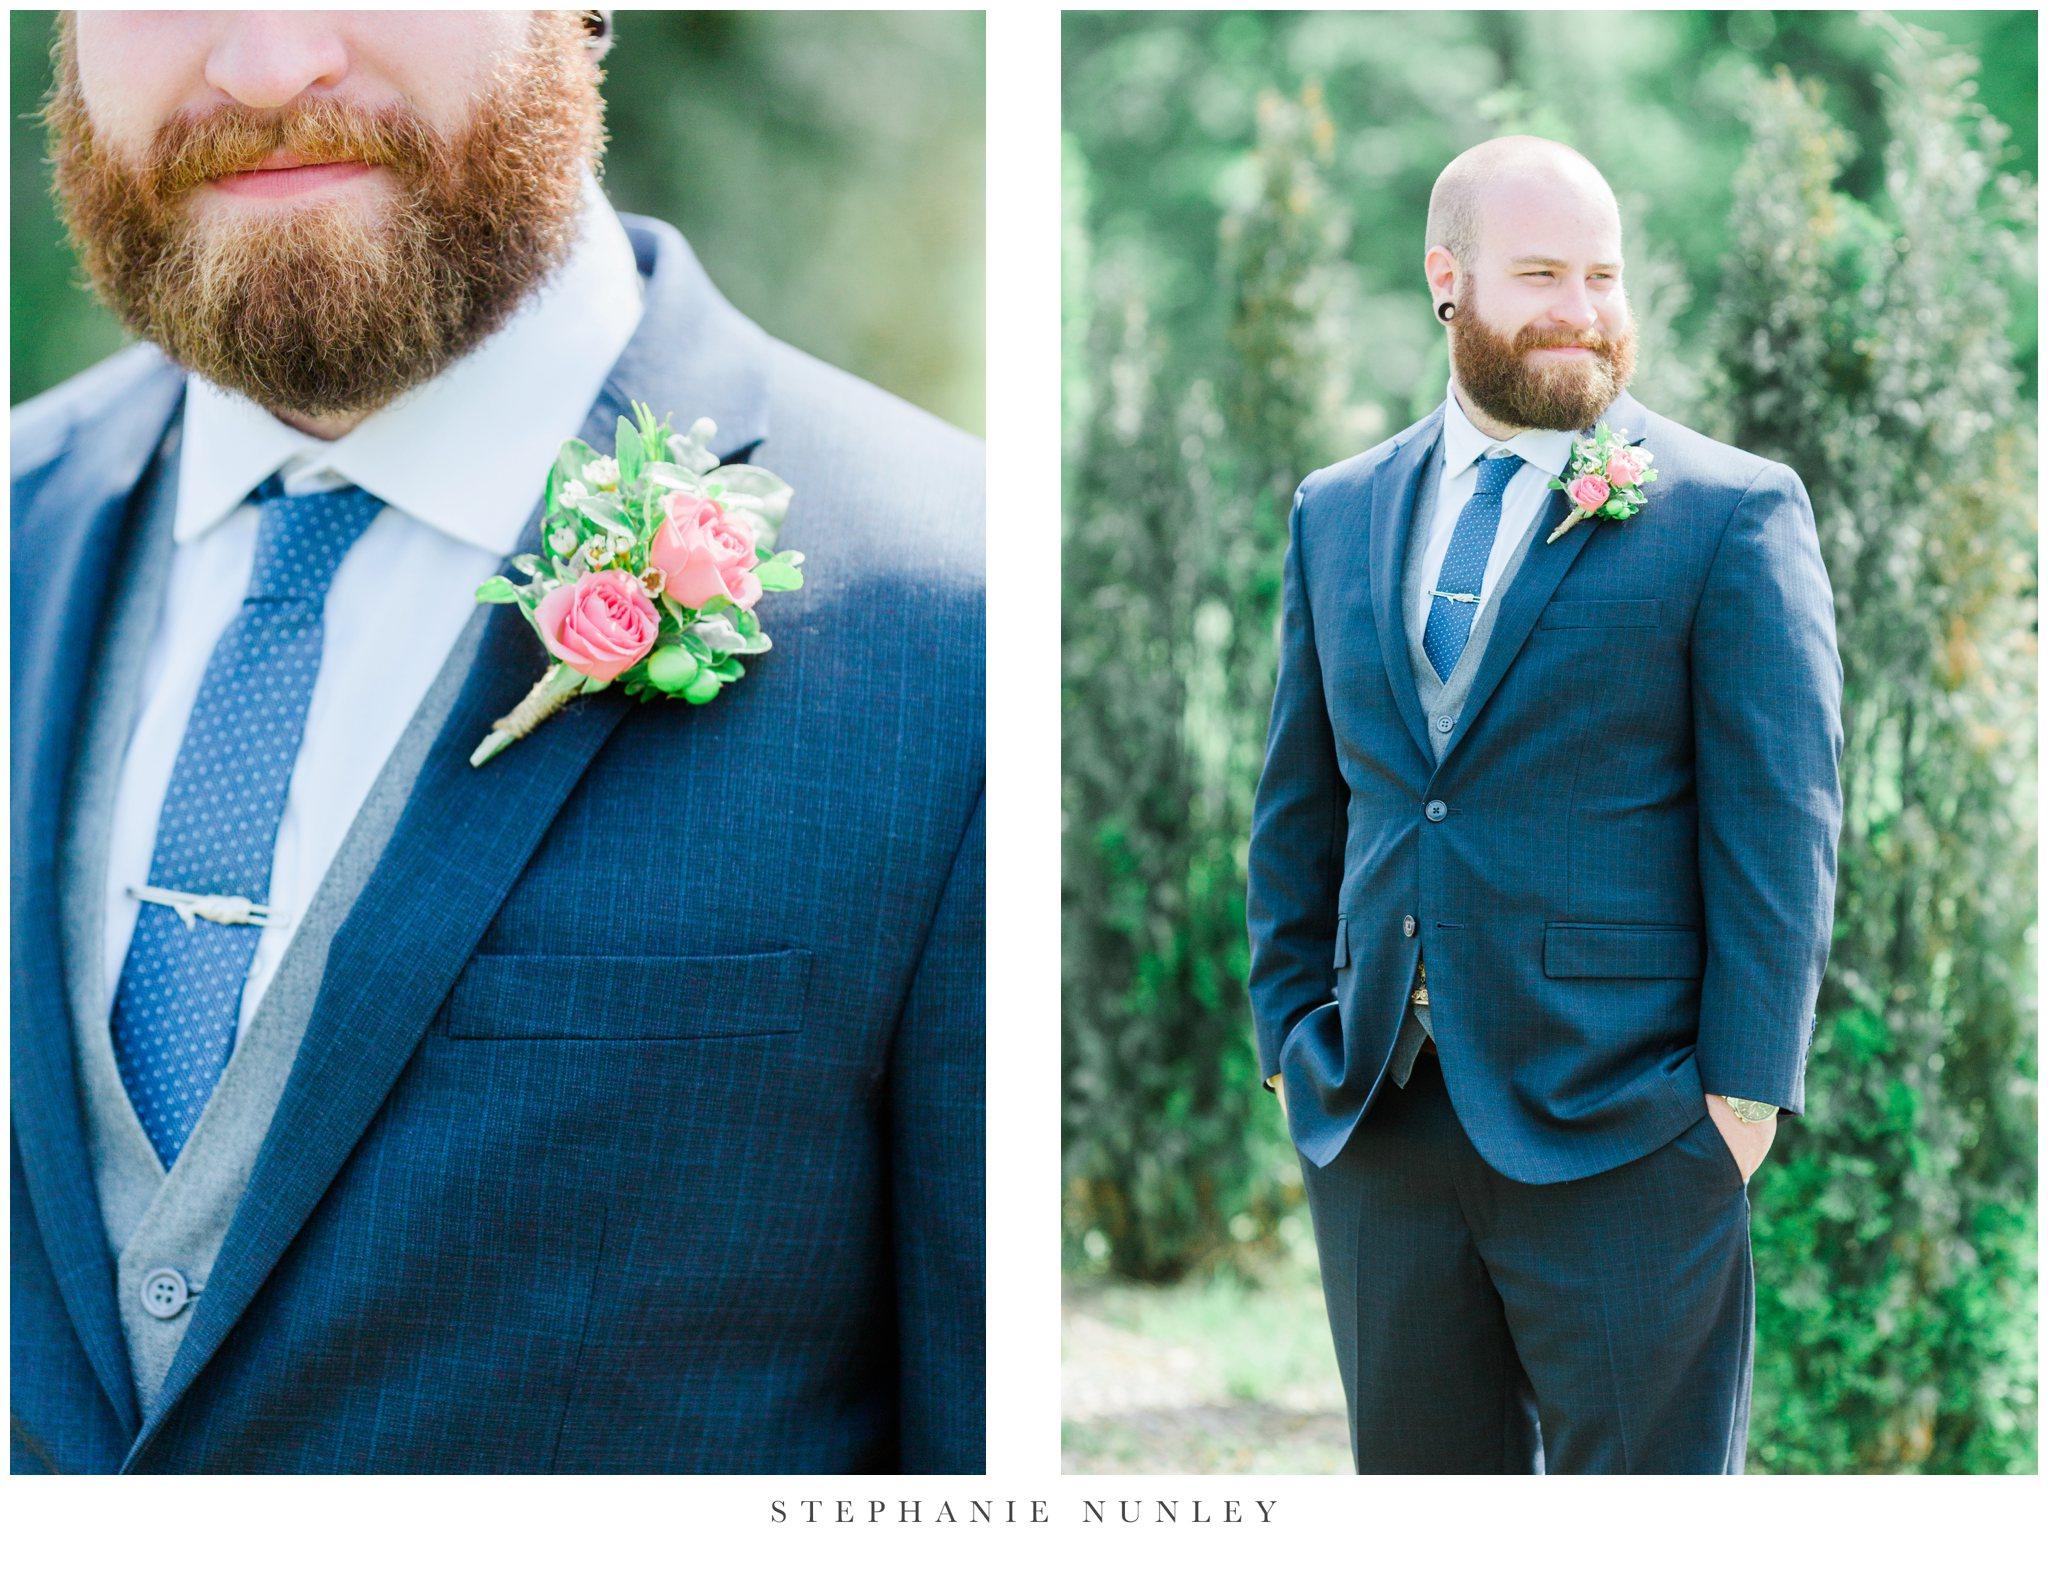 romantic-outdoor-wedding-with-flower-crown-0069.jpg